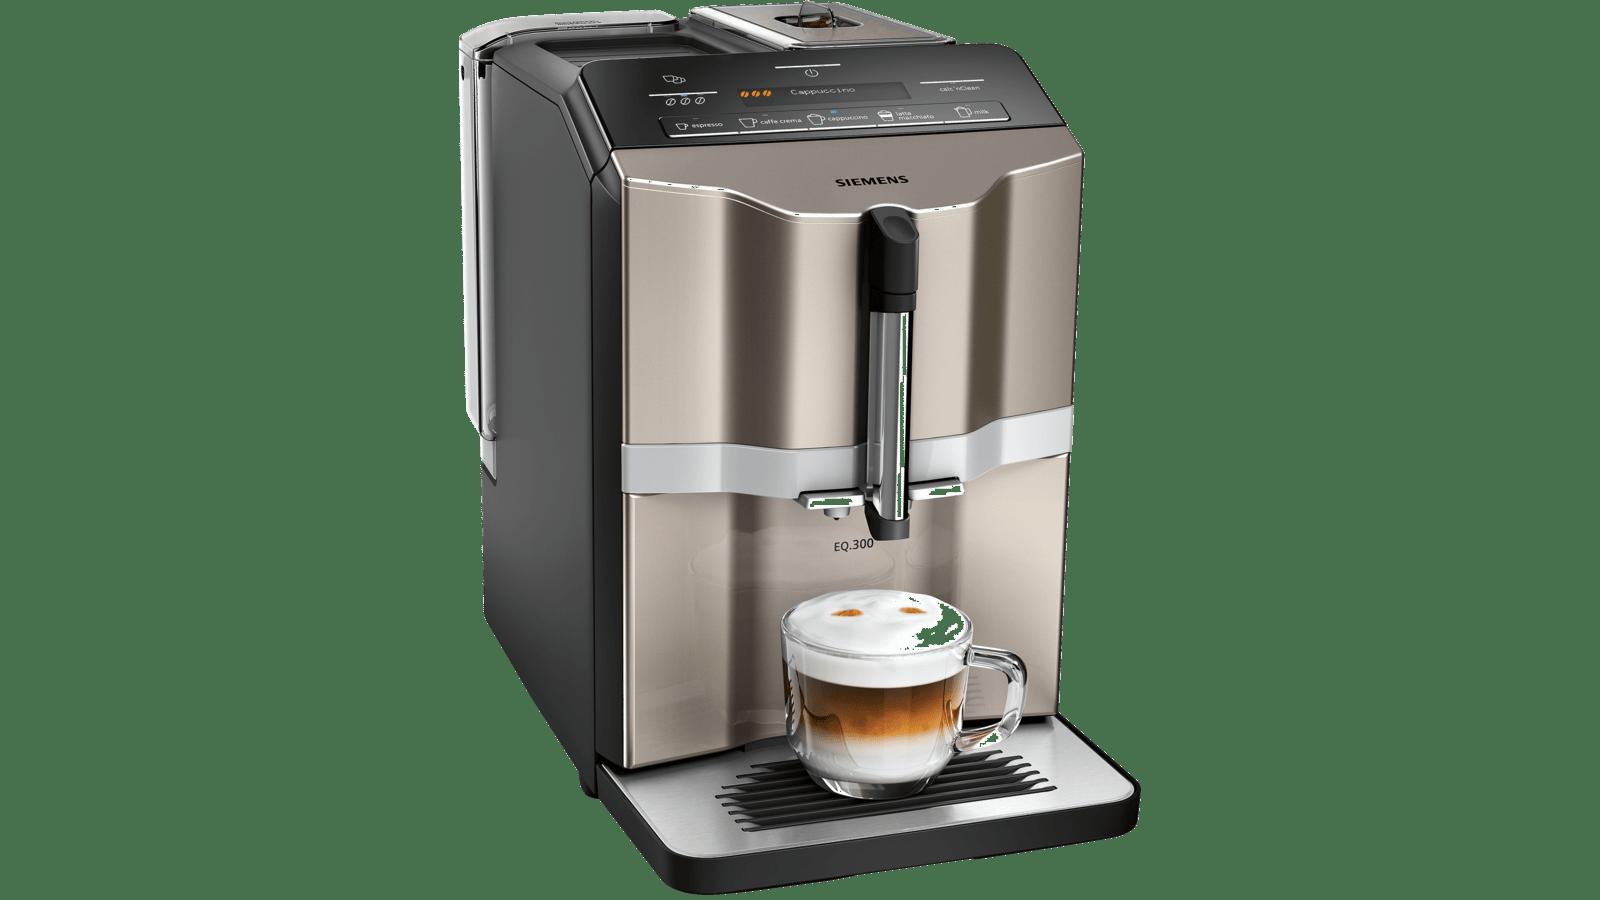 SIEMENS - TI353204RW - Tam Otomatik Kahve Makinesi